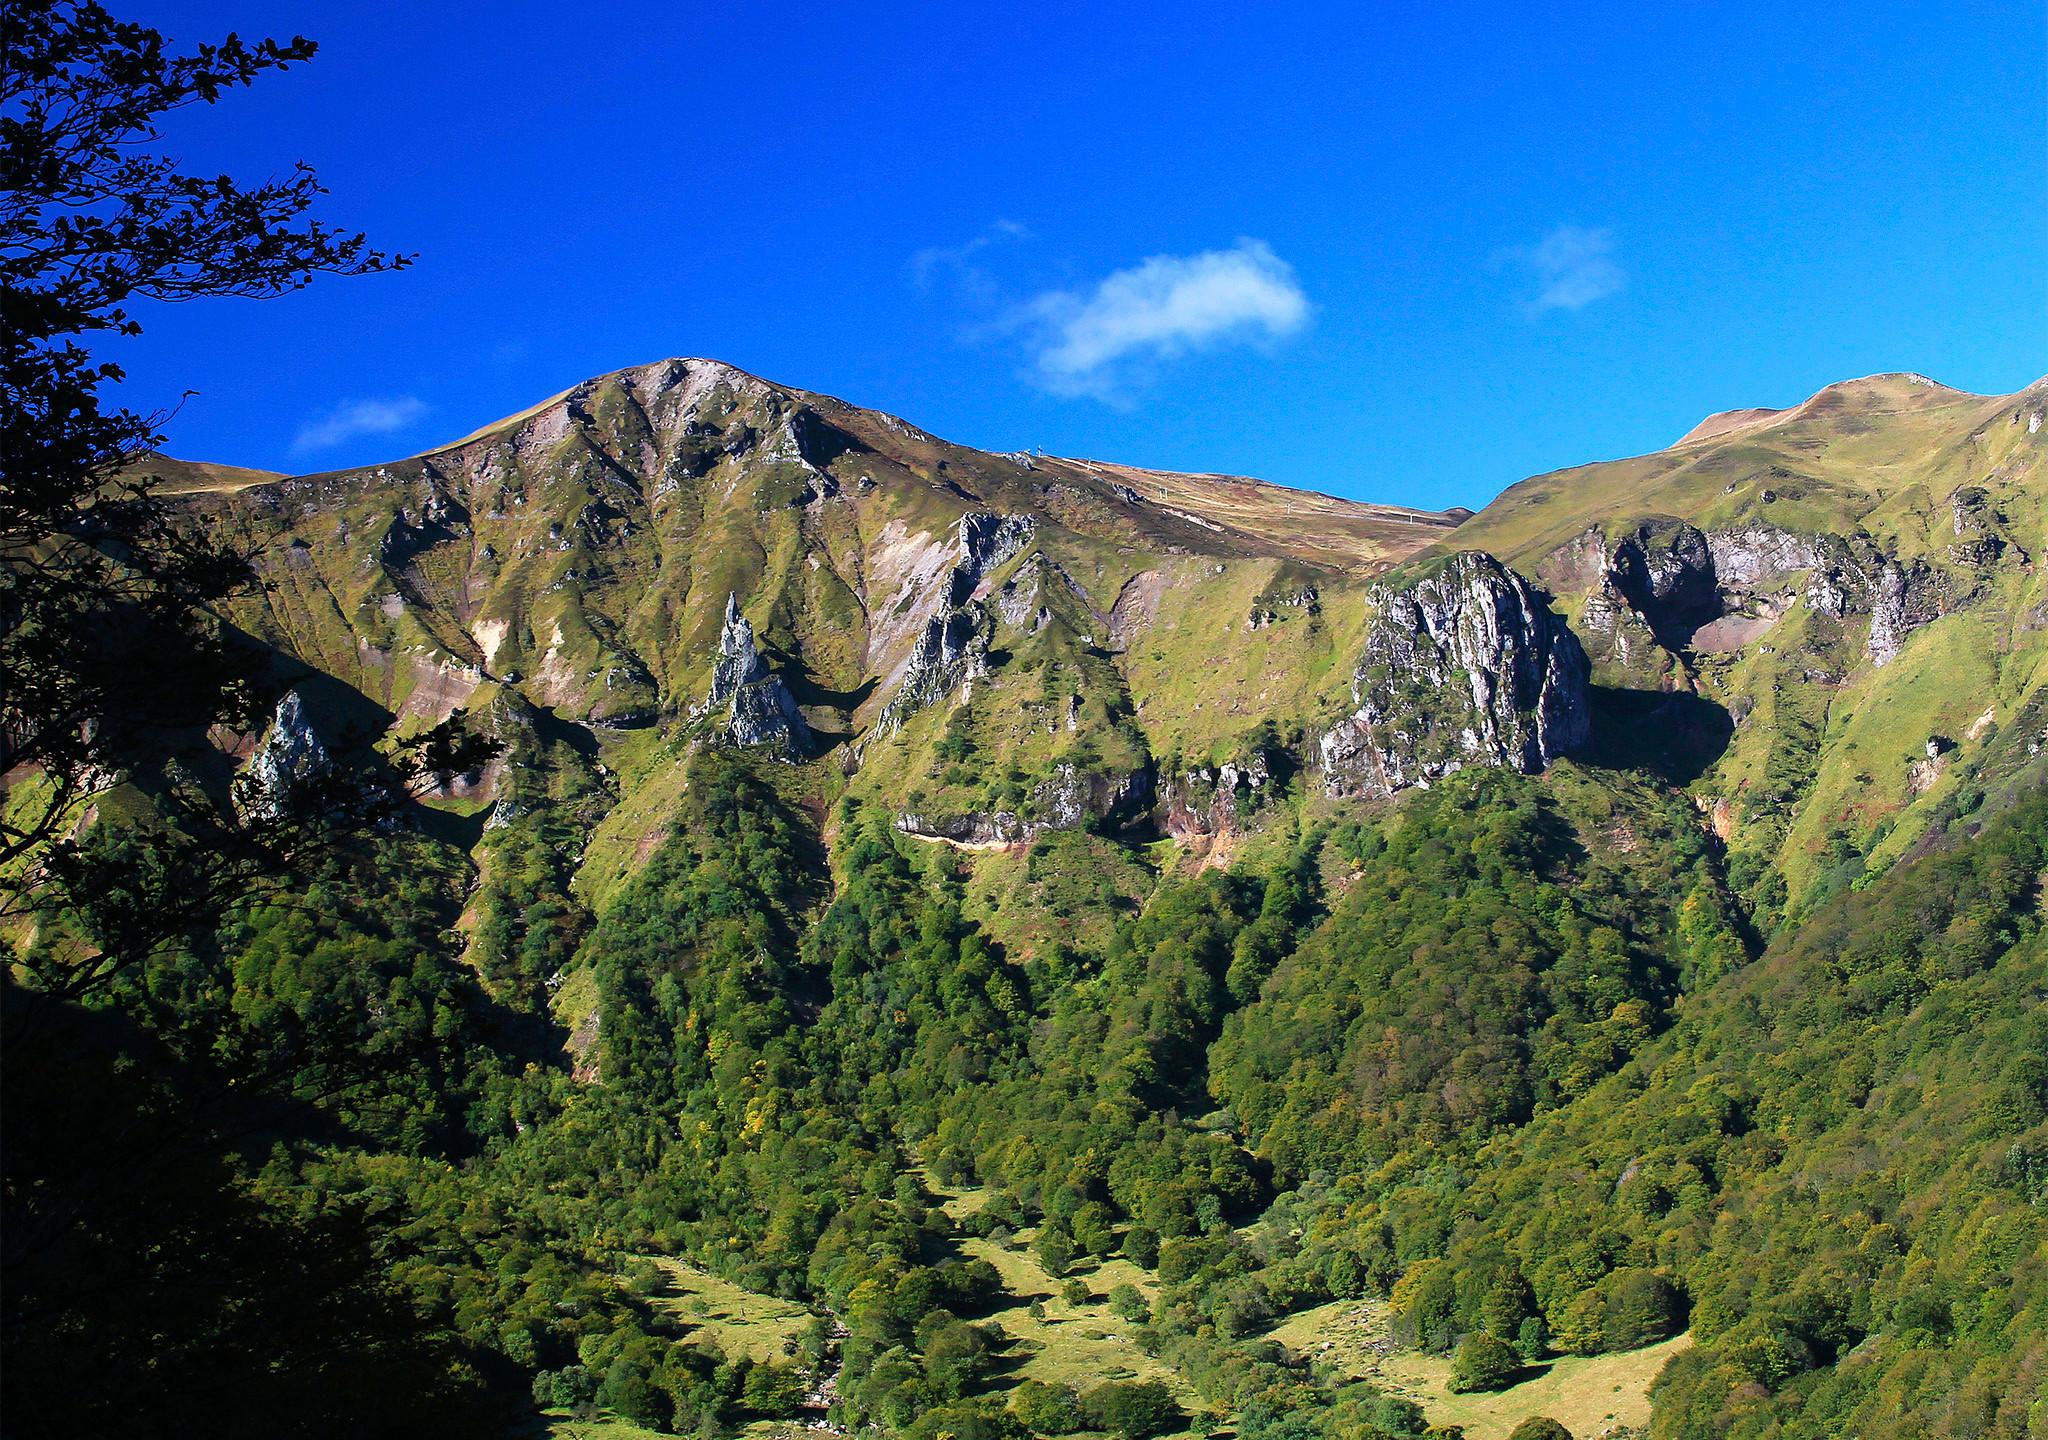 Panorama_Vallée_de_Chaudefour_09-2017